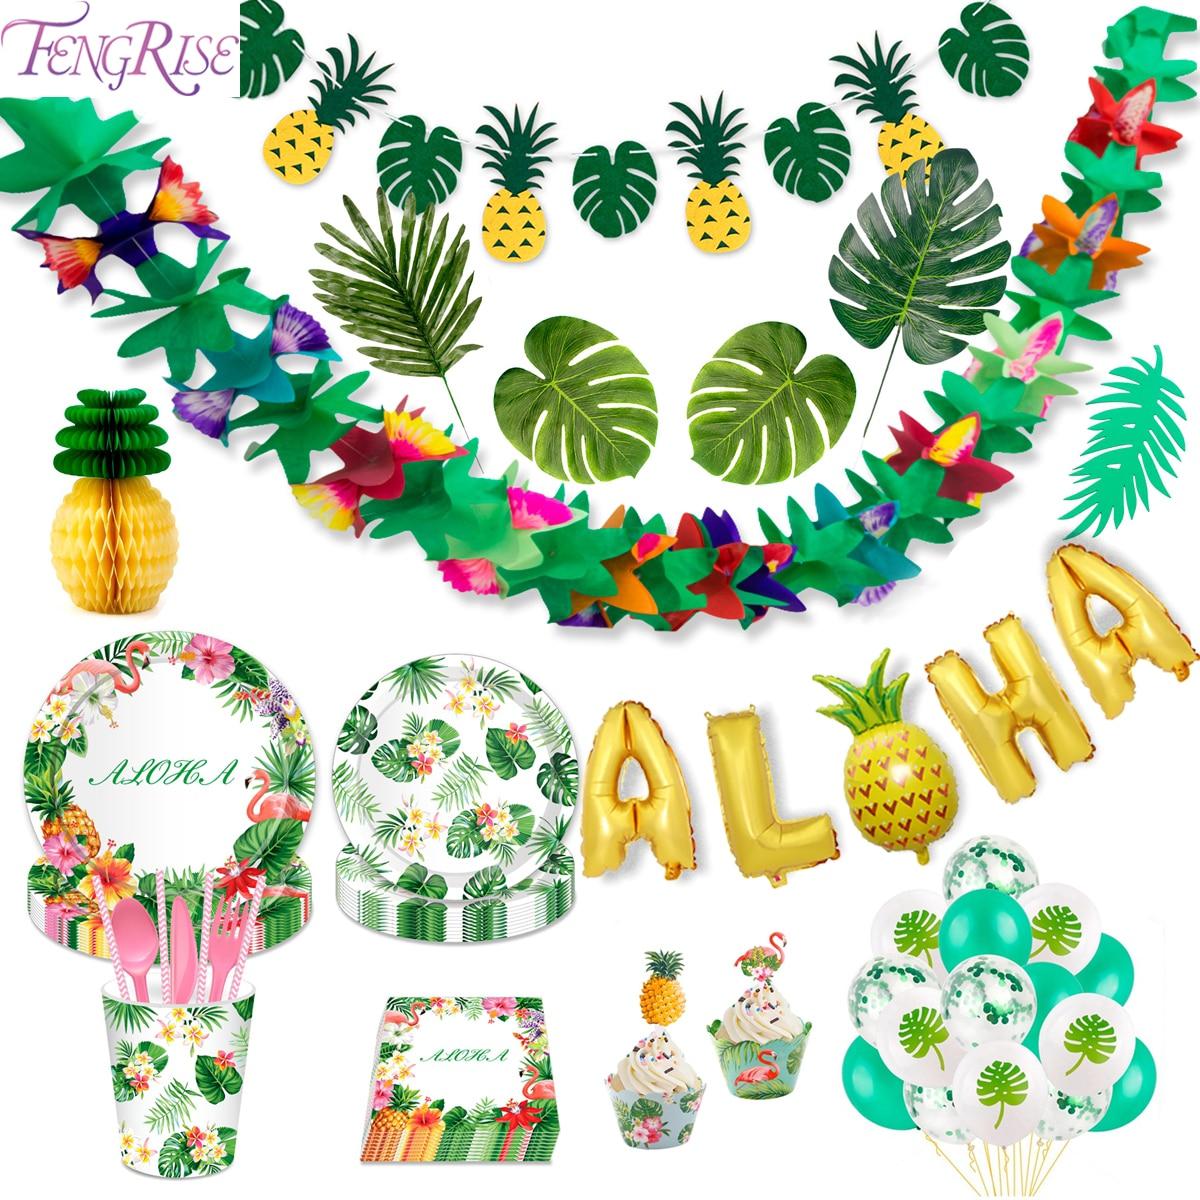 US $9.9 FENGRISE Palm Leaf Hawaiian Party Decorations Hawaii Tropical  Party Summer Flamingo Party Luau Wedding Decor Aloha PineappleParty DIY